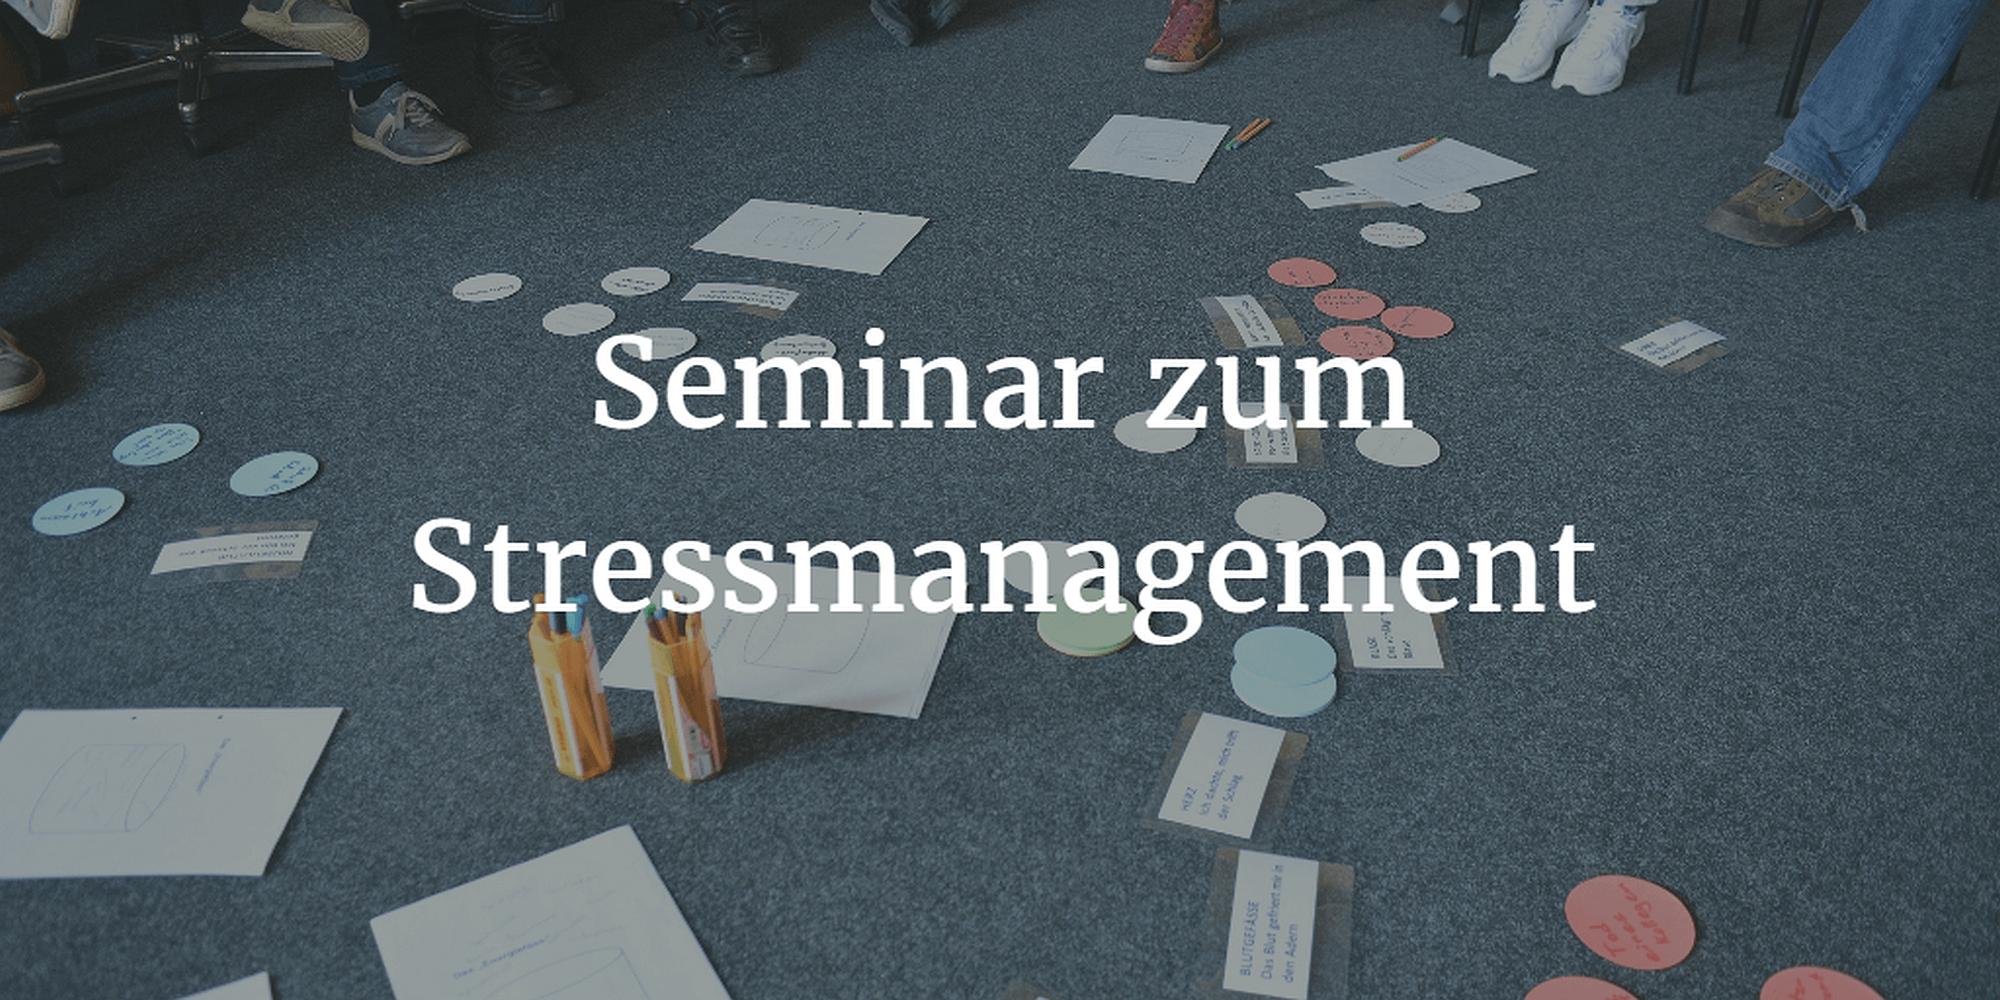 Seminar zum Stressmanagement (c) fsHH pixabay.de